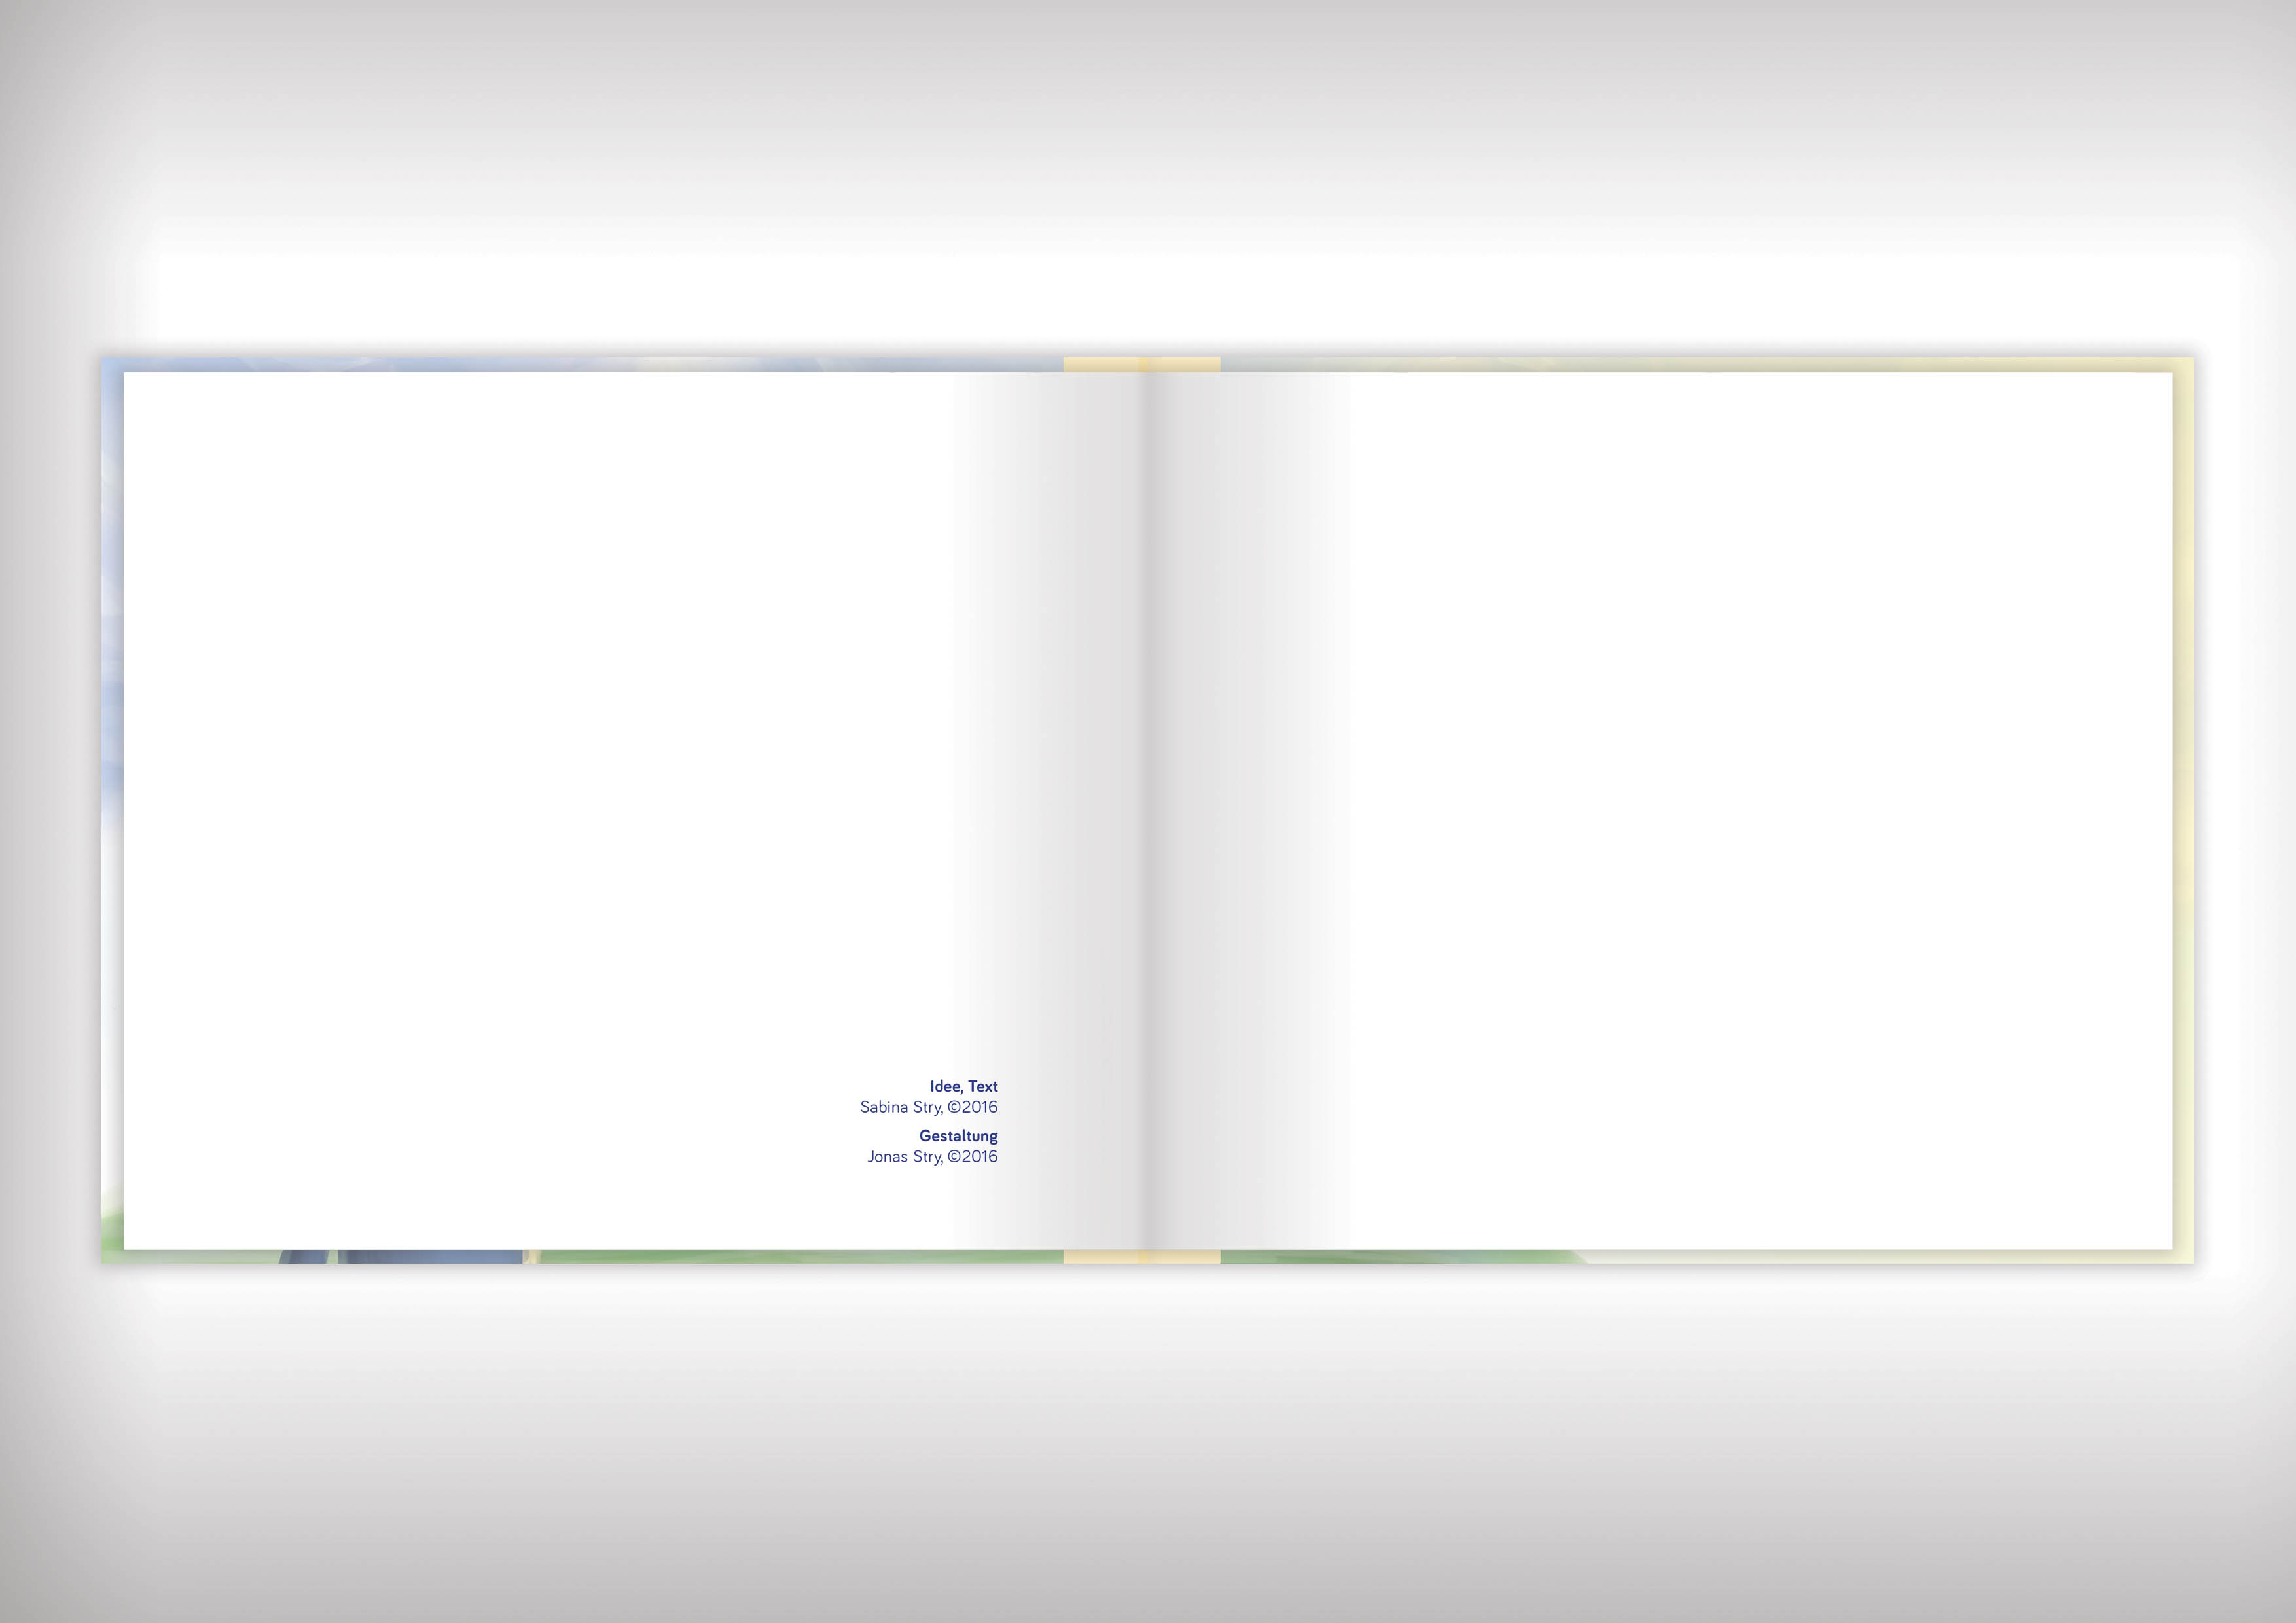 Kinderbuch_Mockup_01 MERGED_0001_Seite_34